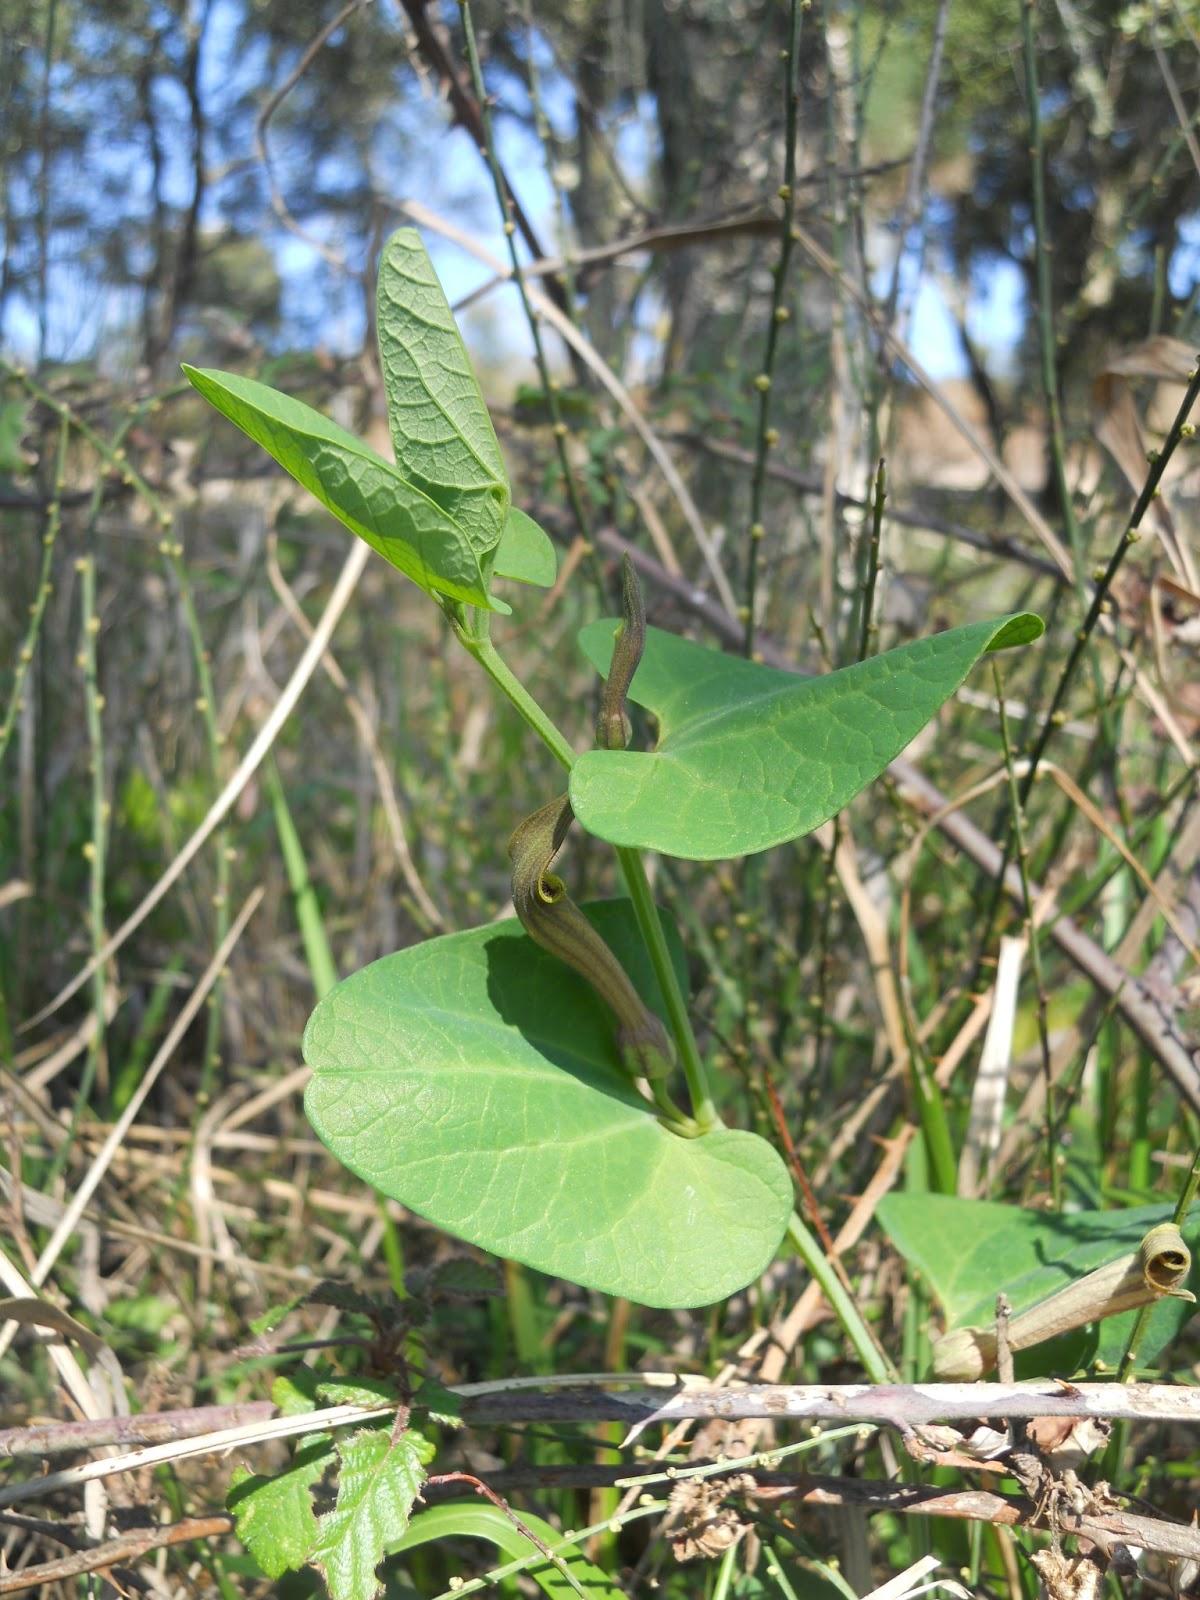 Aristolochia nutricia da bolboreta  Iphiclides podalirius